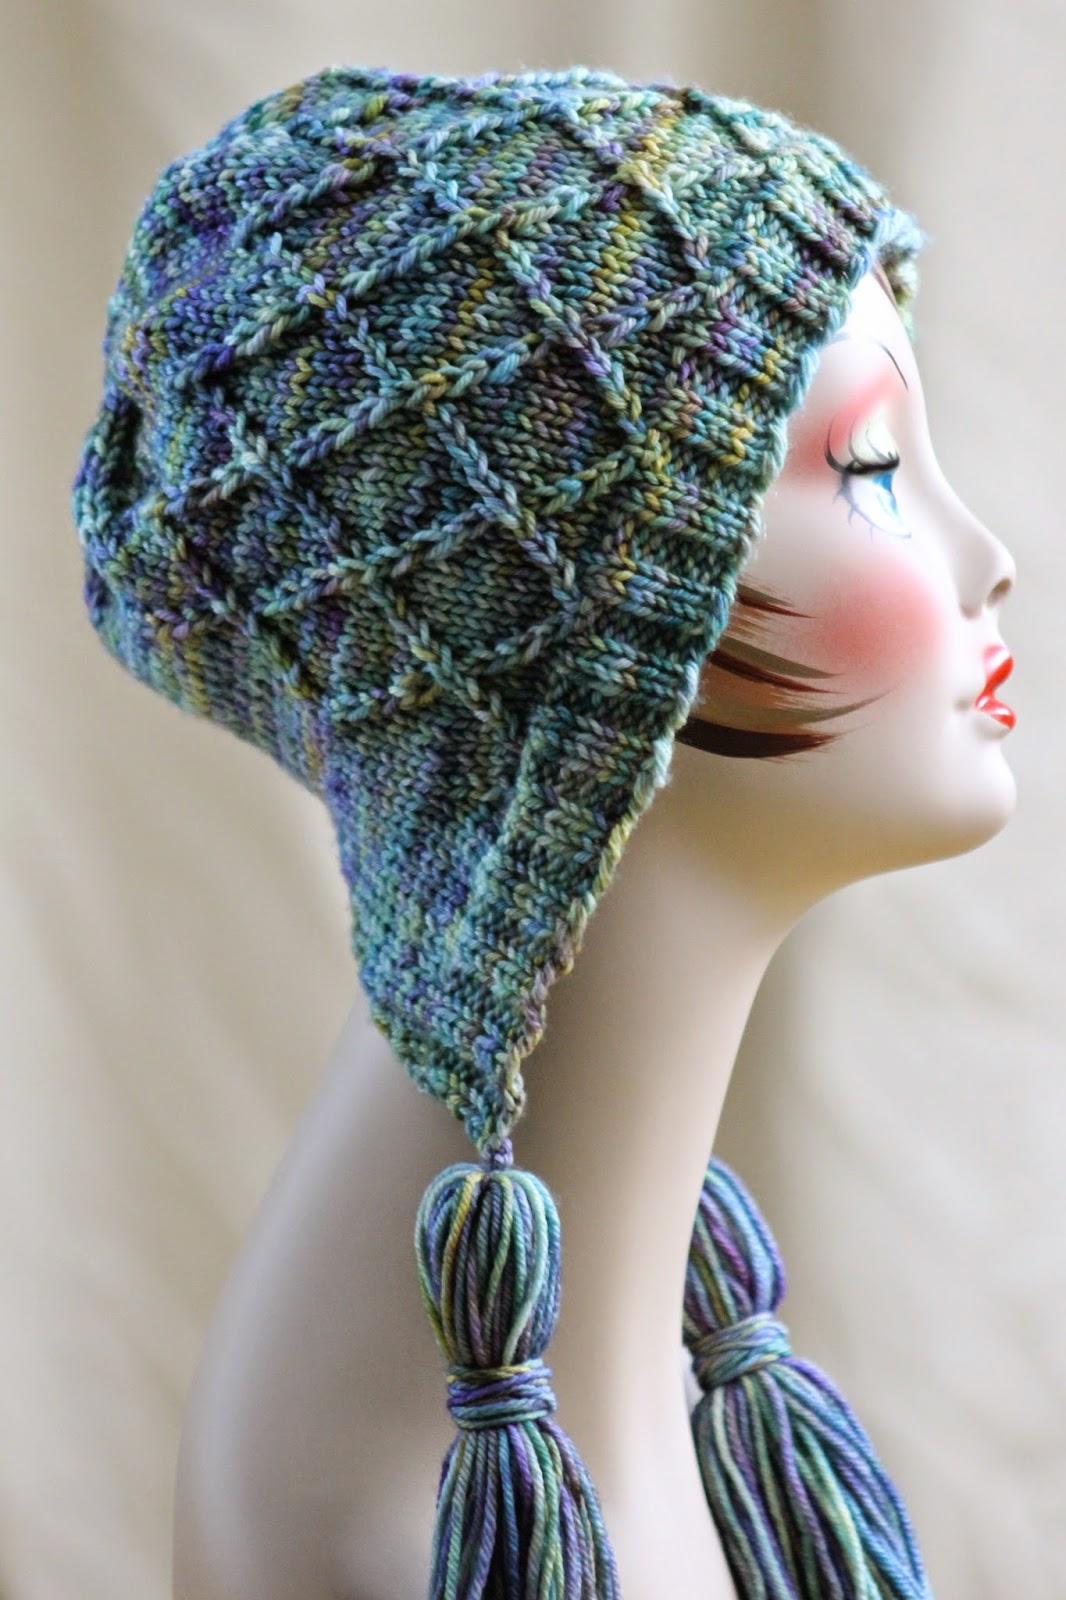 Knitted Dog Jumper Pattern : Balls to the Walls Knits: Iris Bloom Bonnet